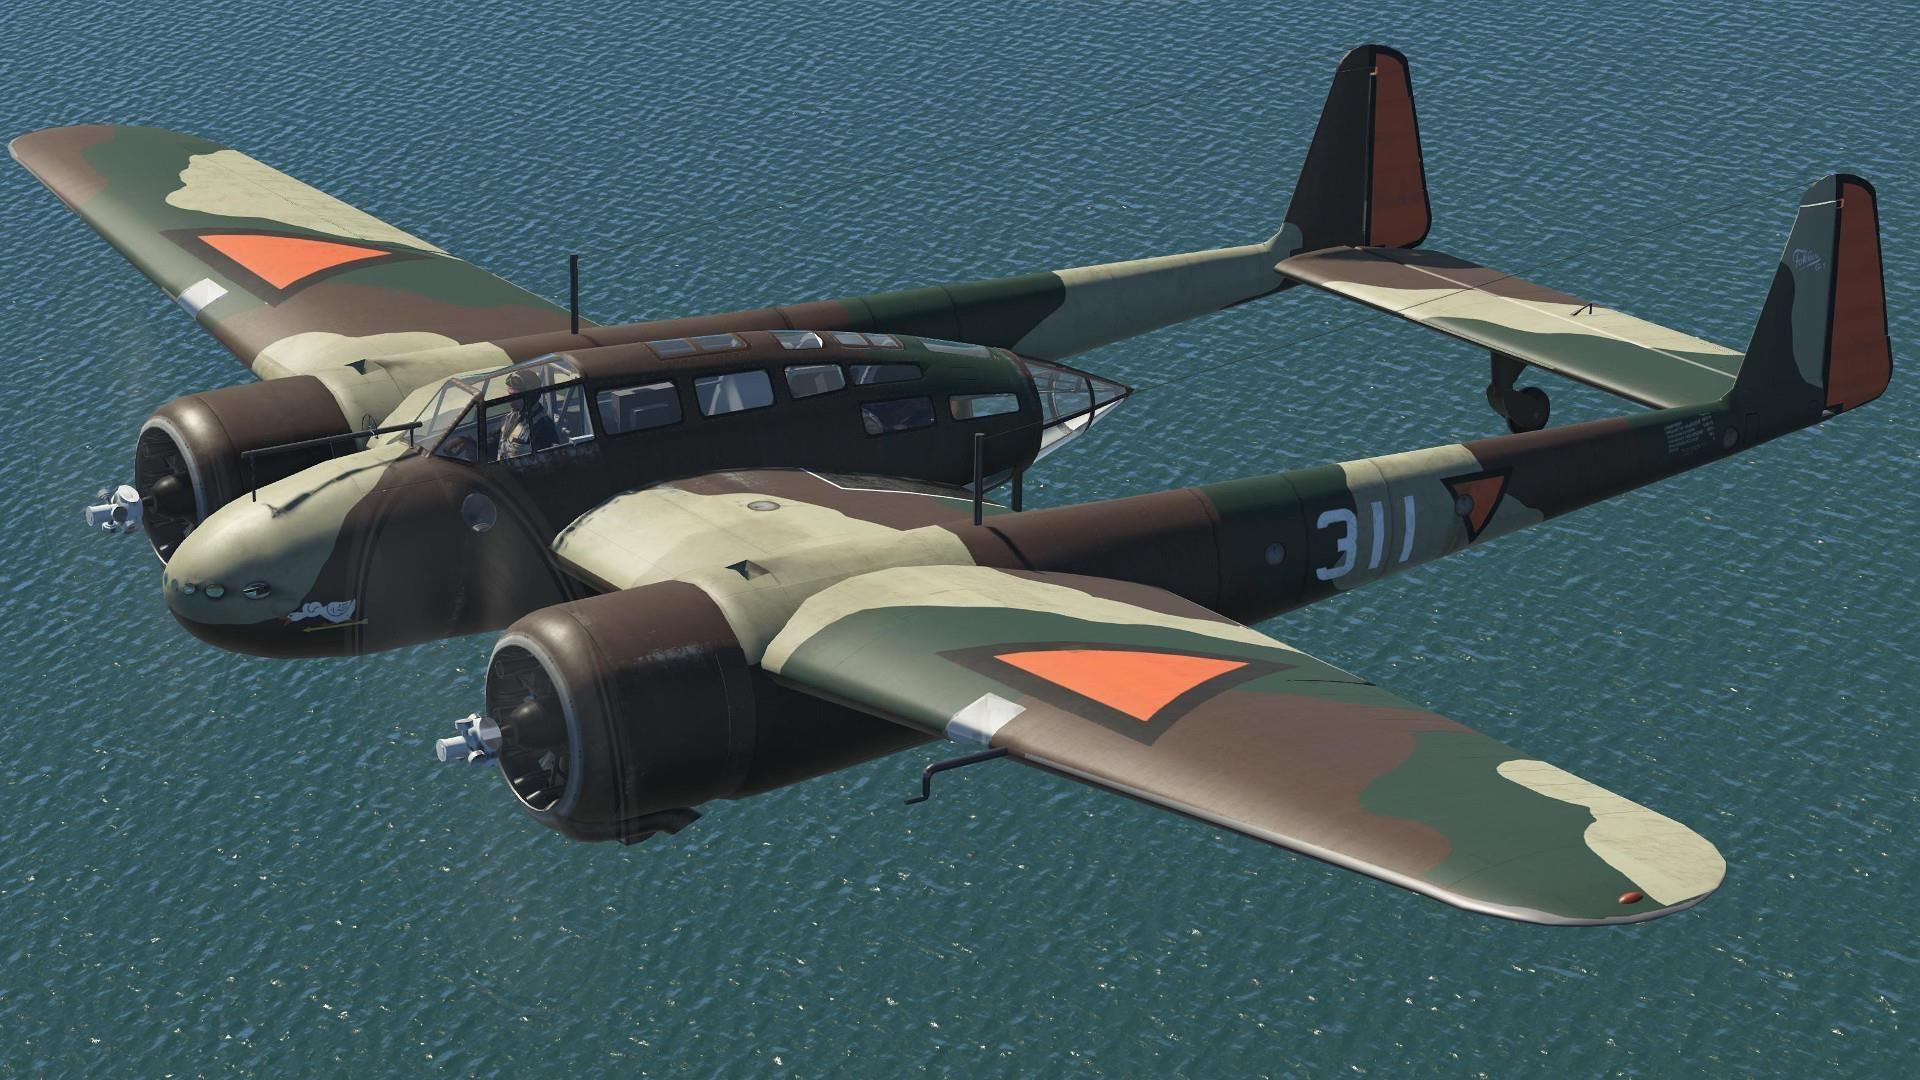 Aircraft Screenshot ww II image by Jacek Lotnictwo, Samolot